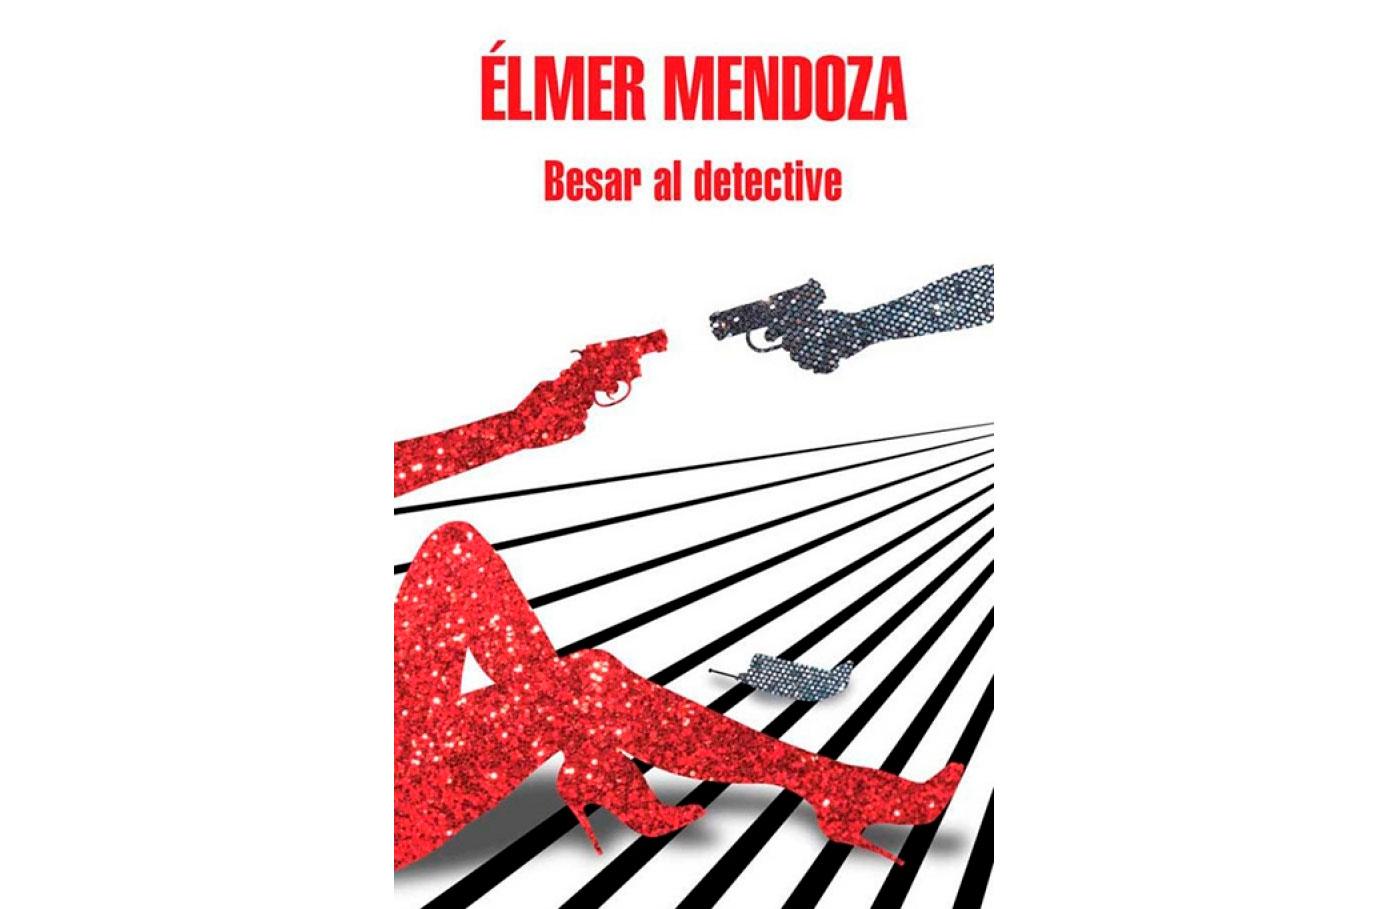 besar-detective-getafe-enrgo